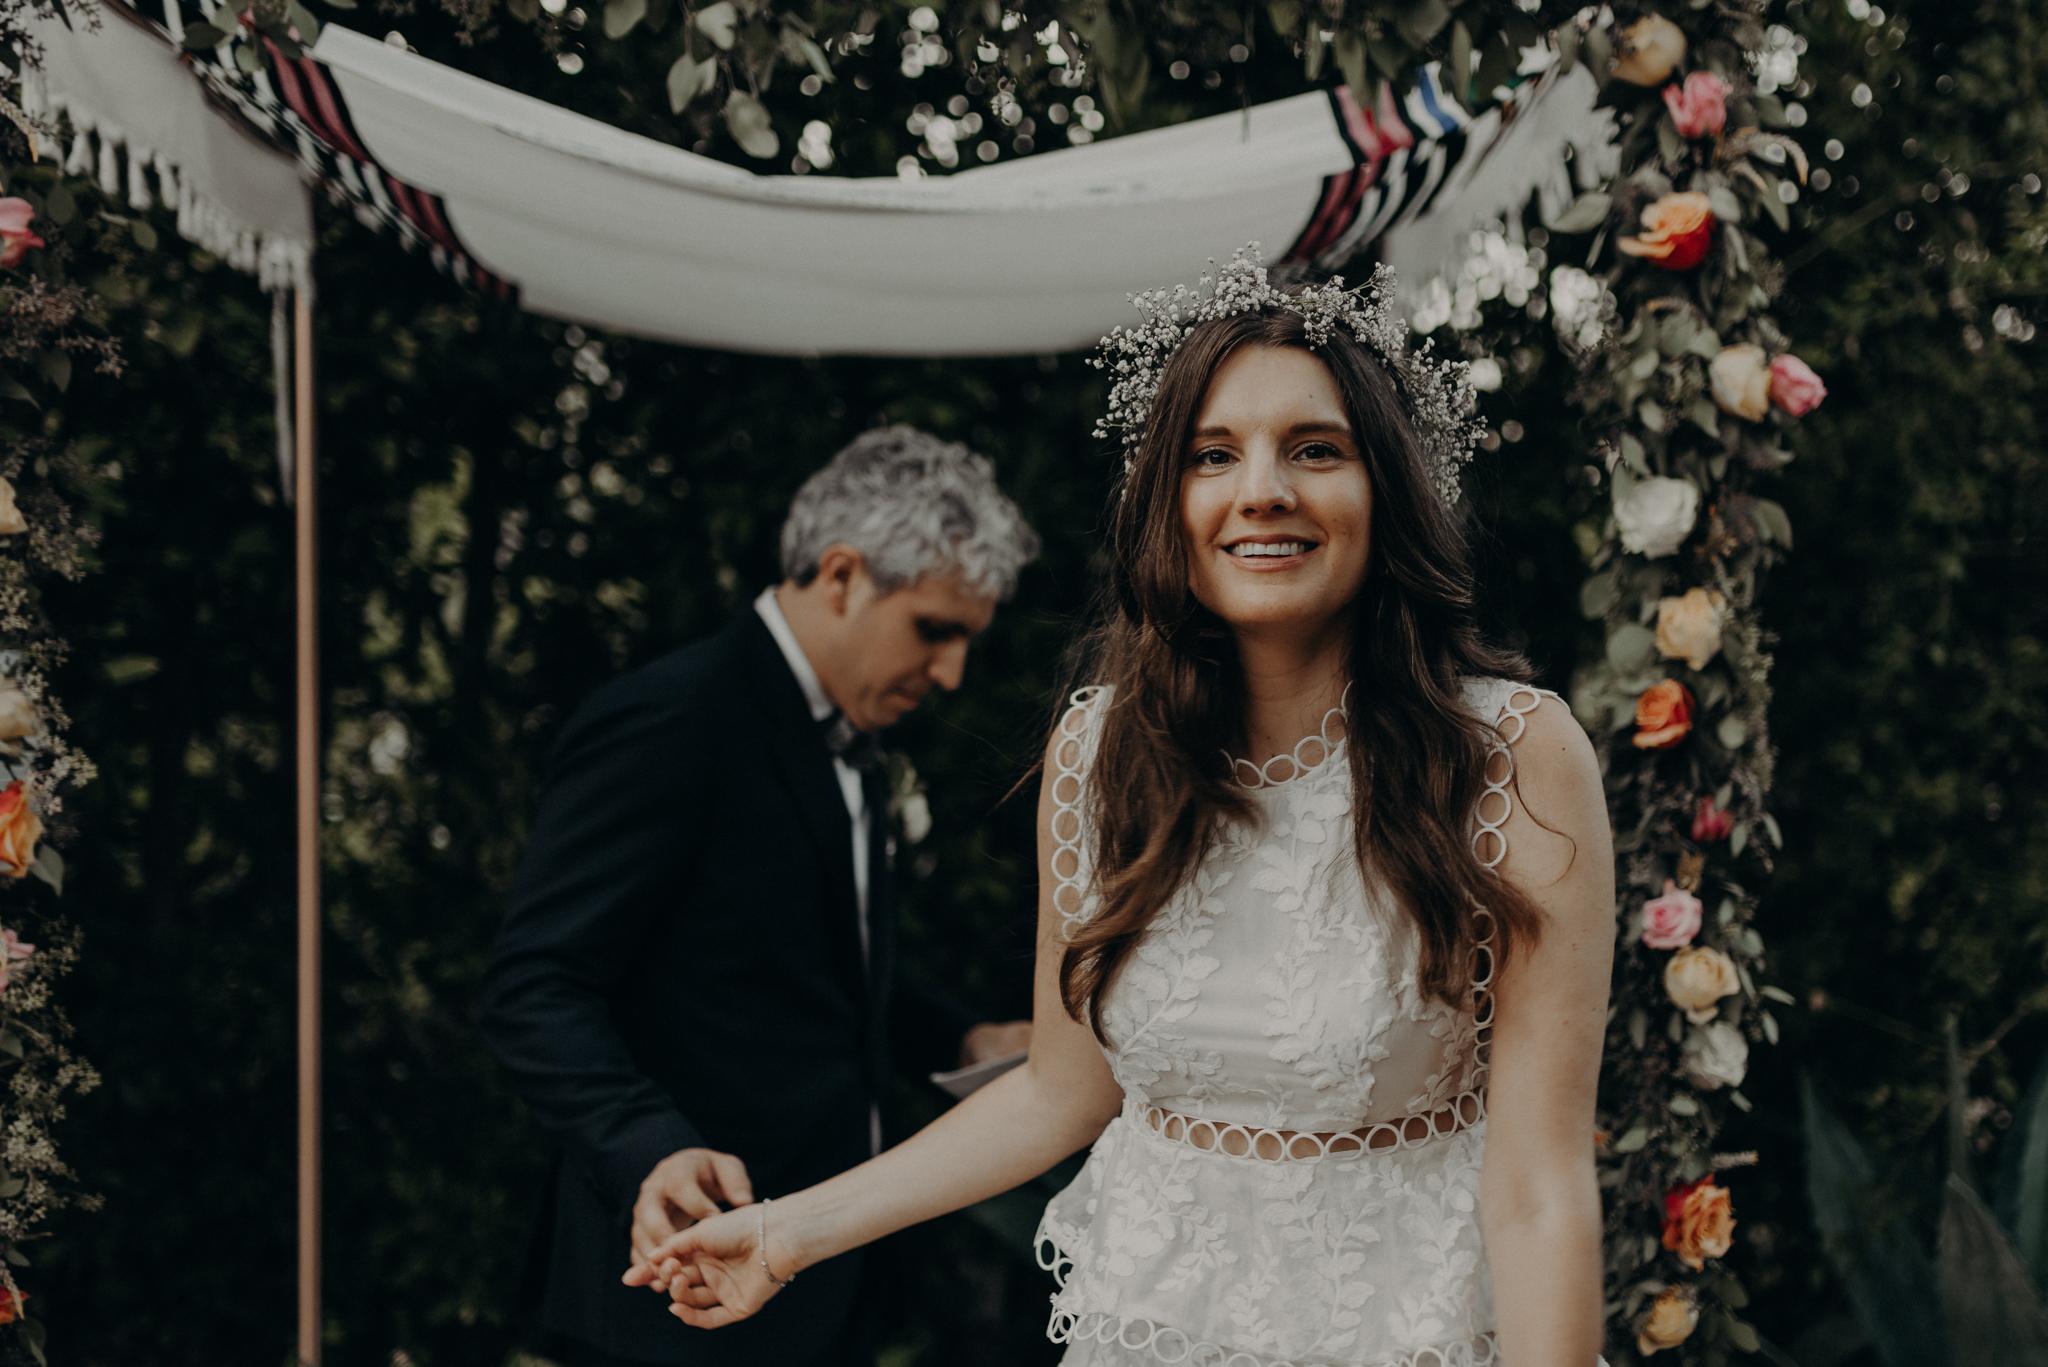 Isaiah + Taylor Photography - Private Estate Backyard Wedding - Beverly Hills - Los Angeles Wedding Photographer - 93.jpg